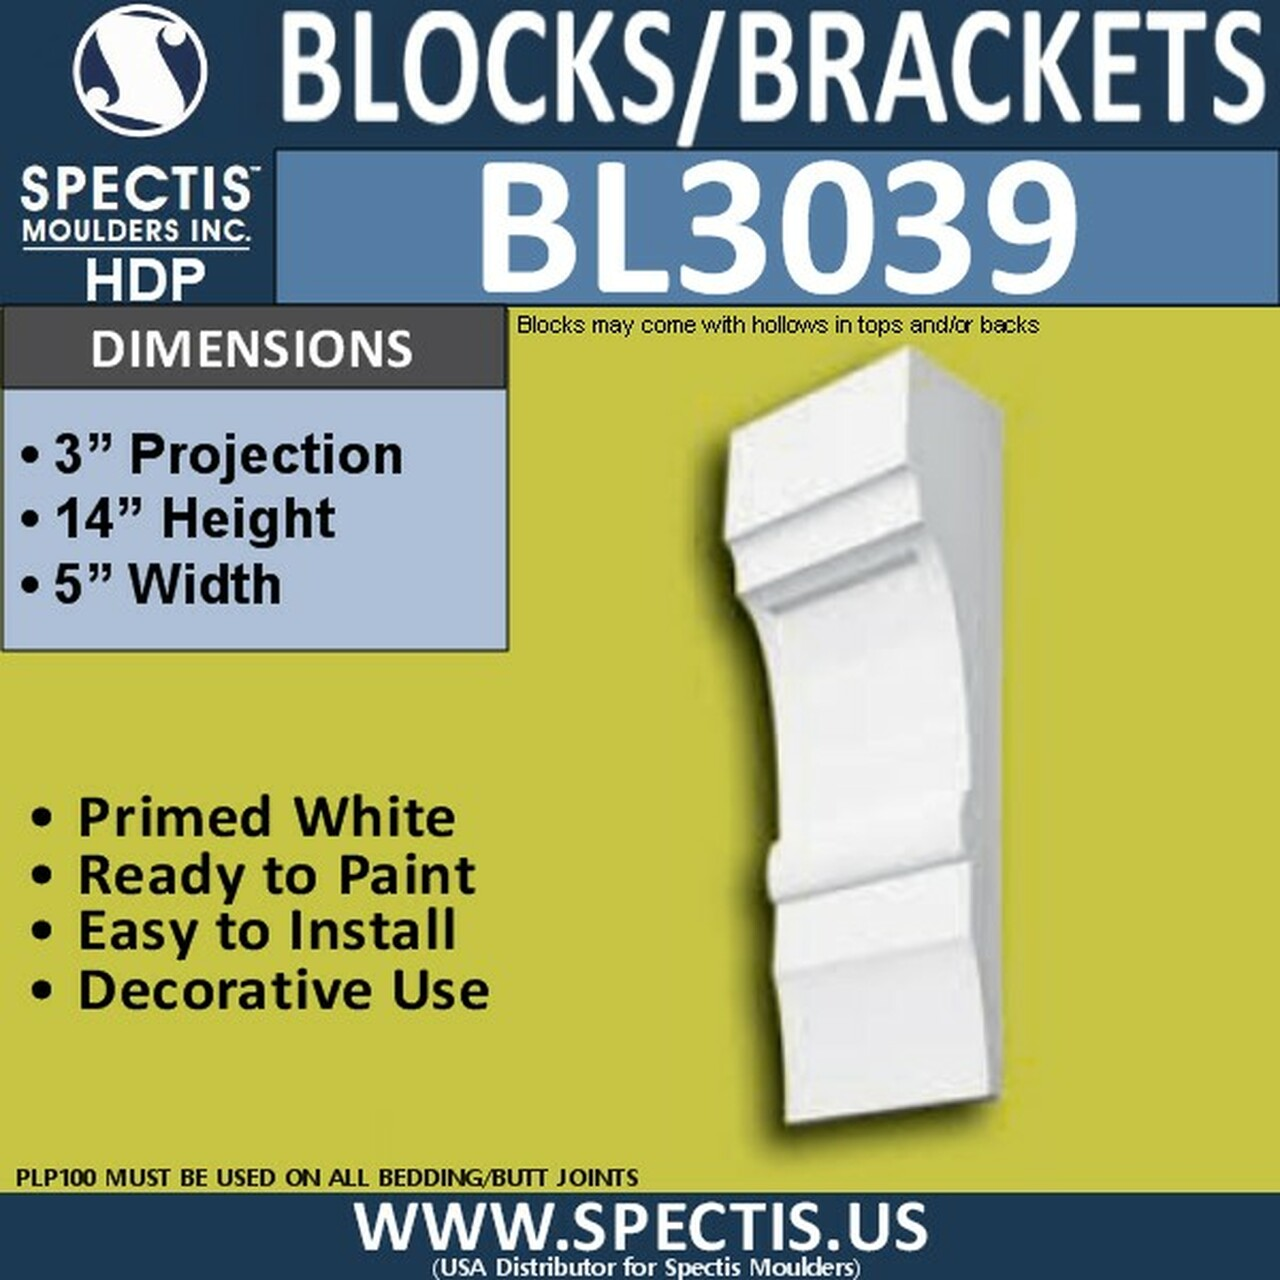 "BL3039 Eave Block or Bracket 5""W x 14""H x 3"" P"